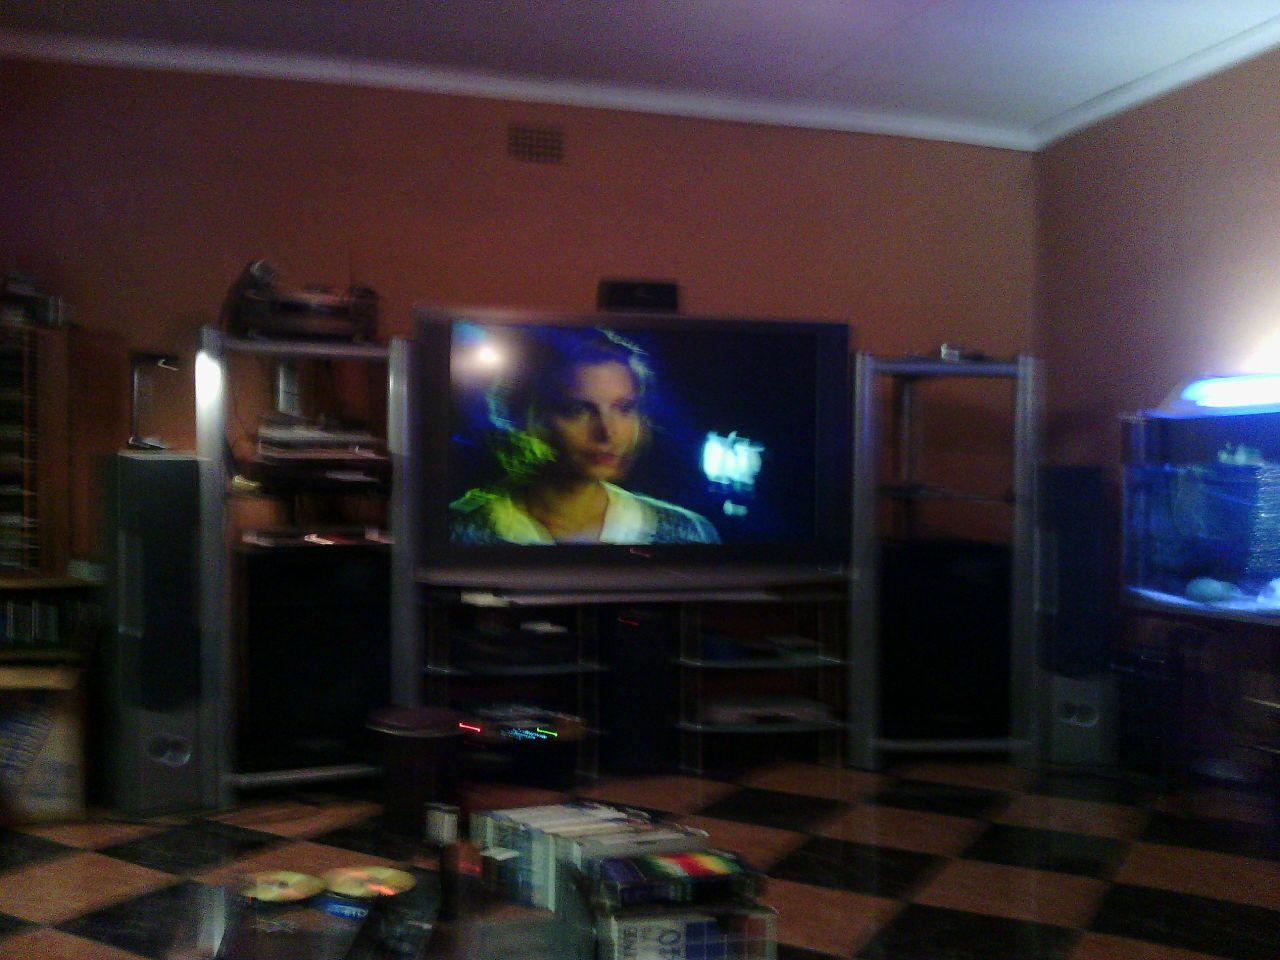 Yamaha amplifier & big size TV